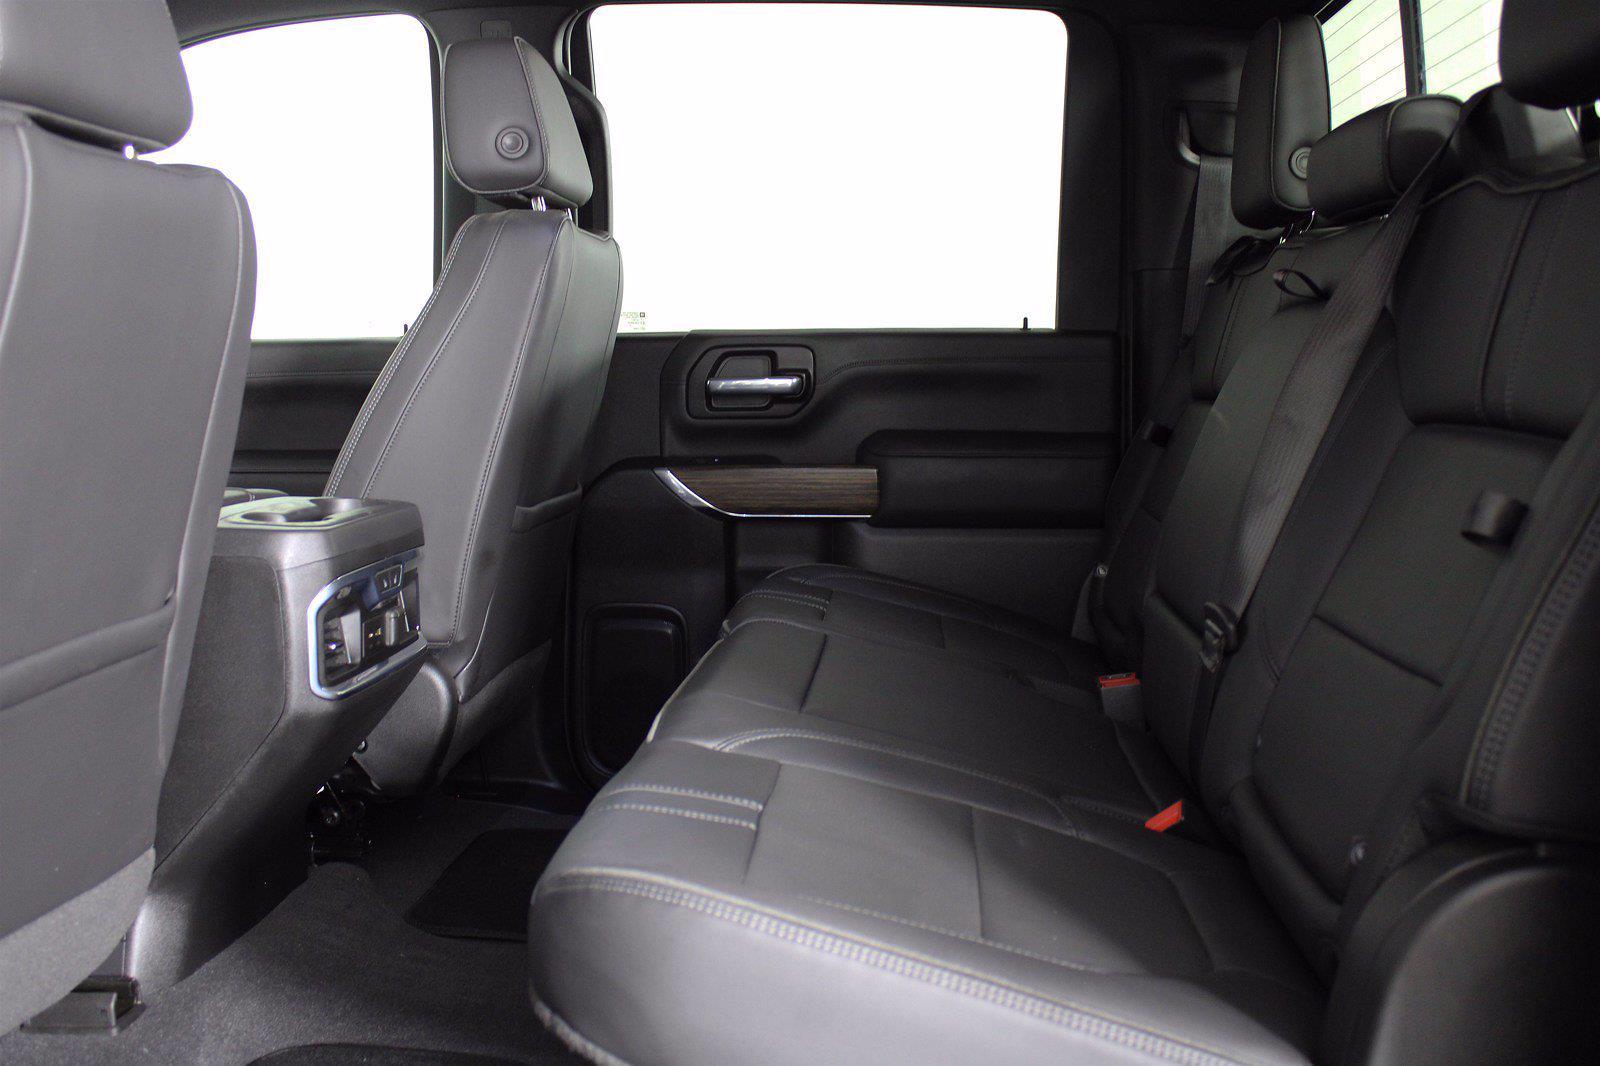 2020 Chevrolet Silverado 3500 Crew Cab 4x4, Pickup #DAZ0421 - photo 3